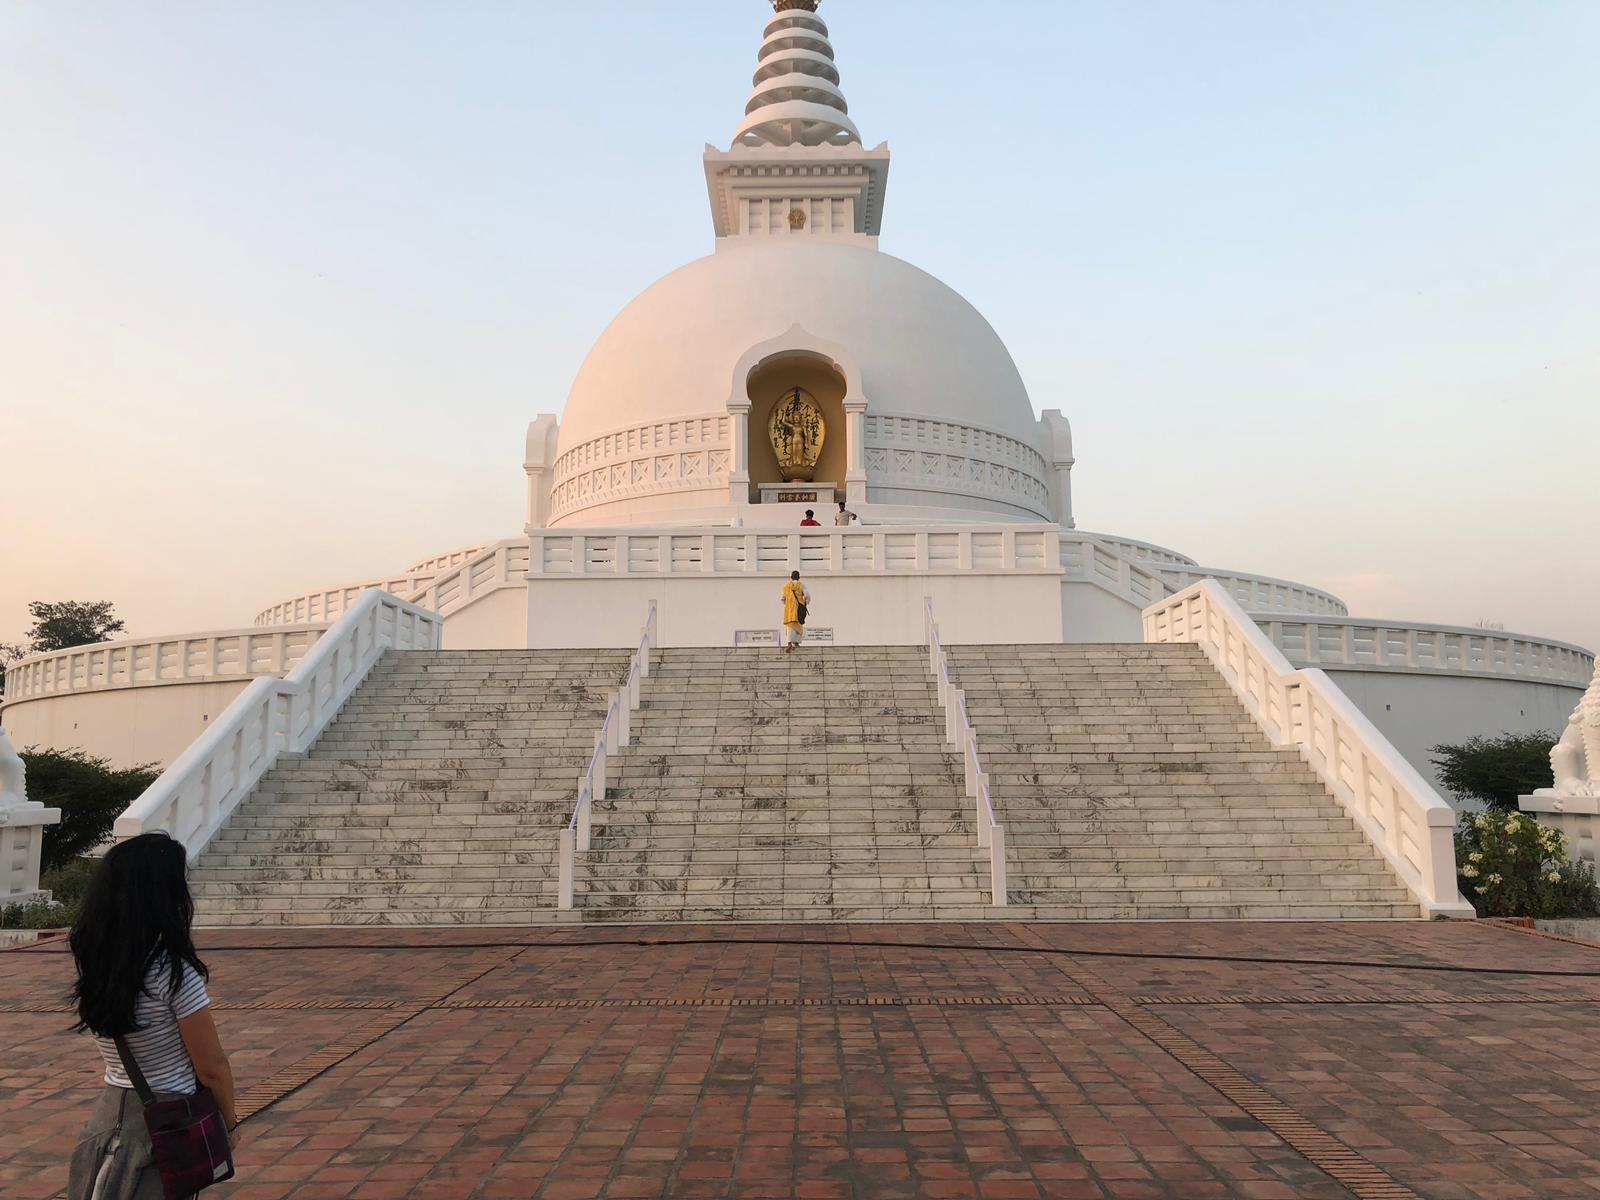 viaggio-in-nepal-0a64aa79cef4b20ca1a8ac1